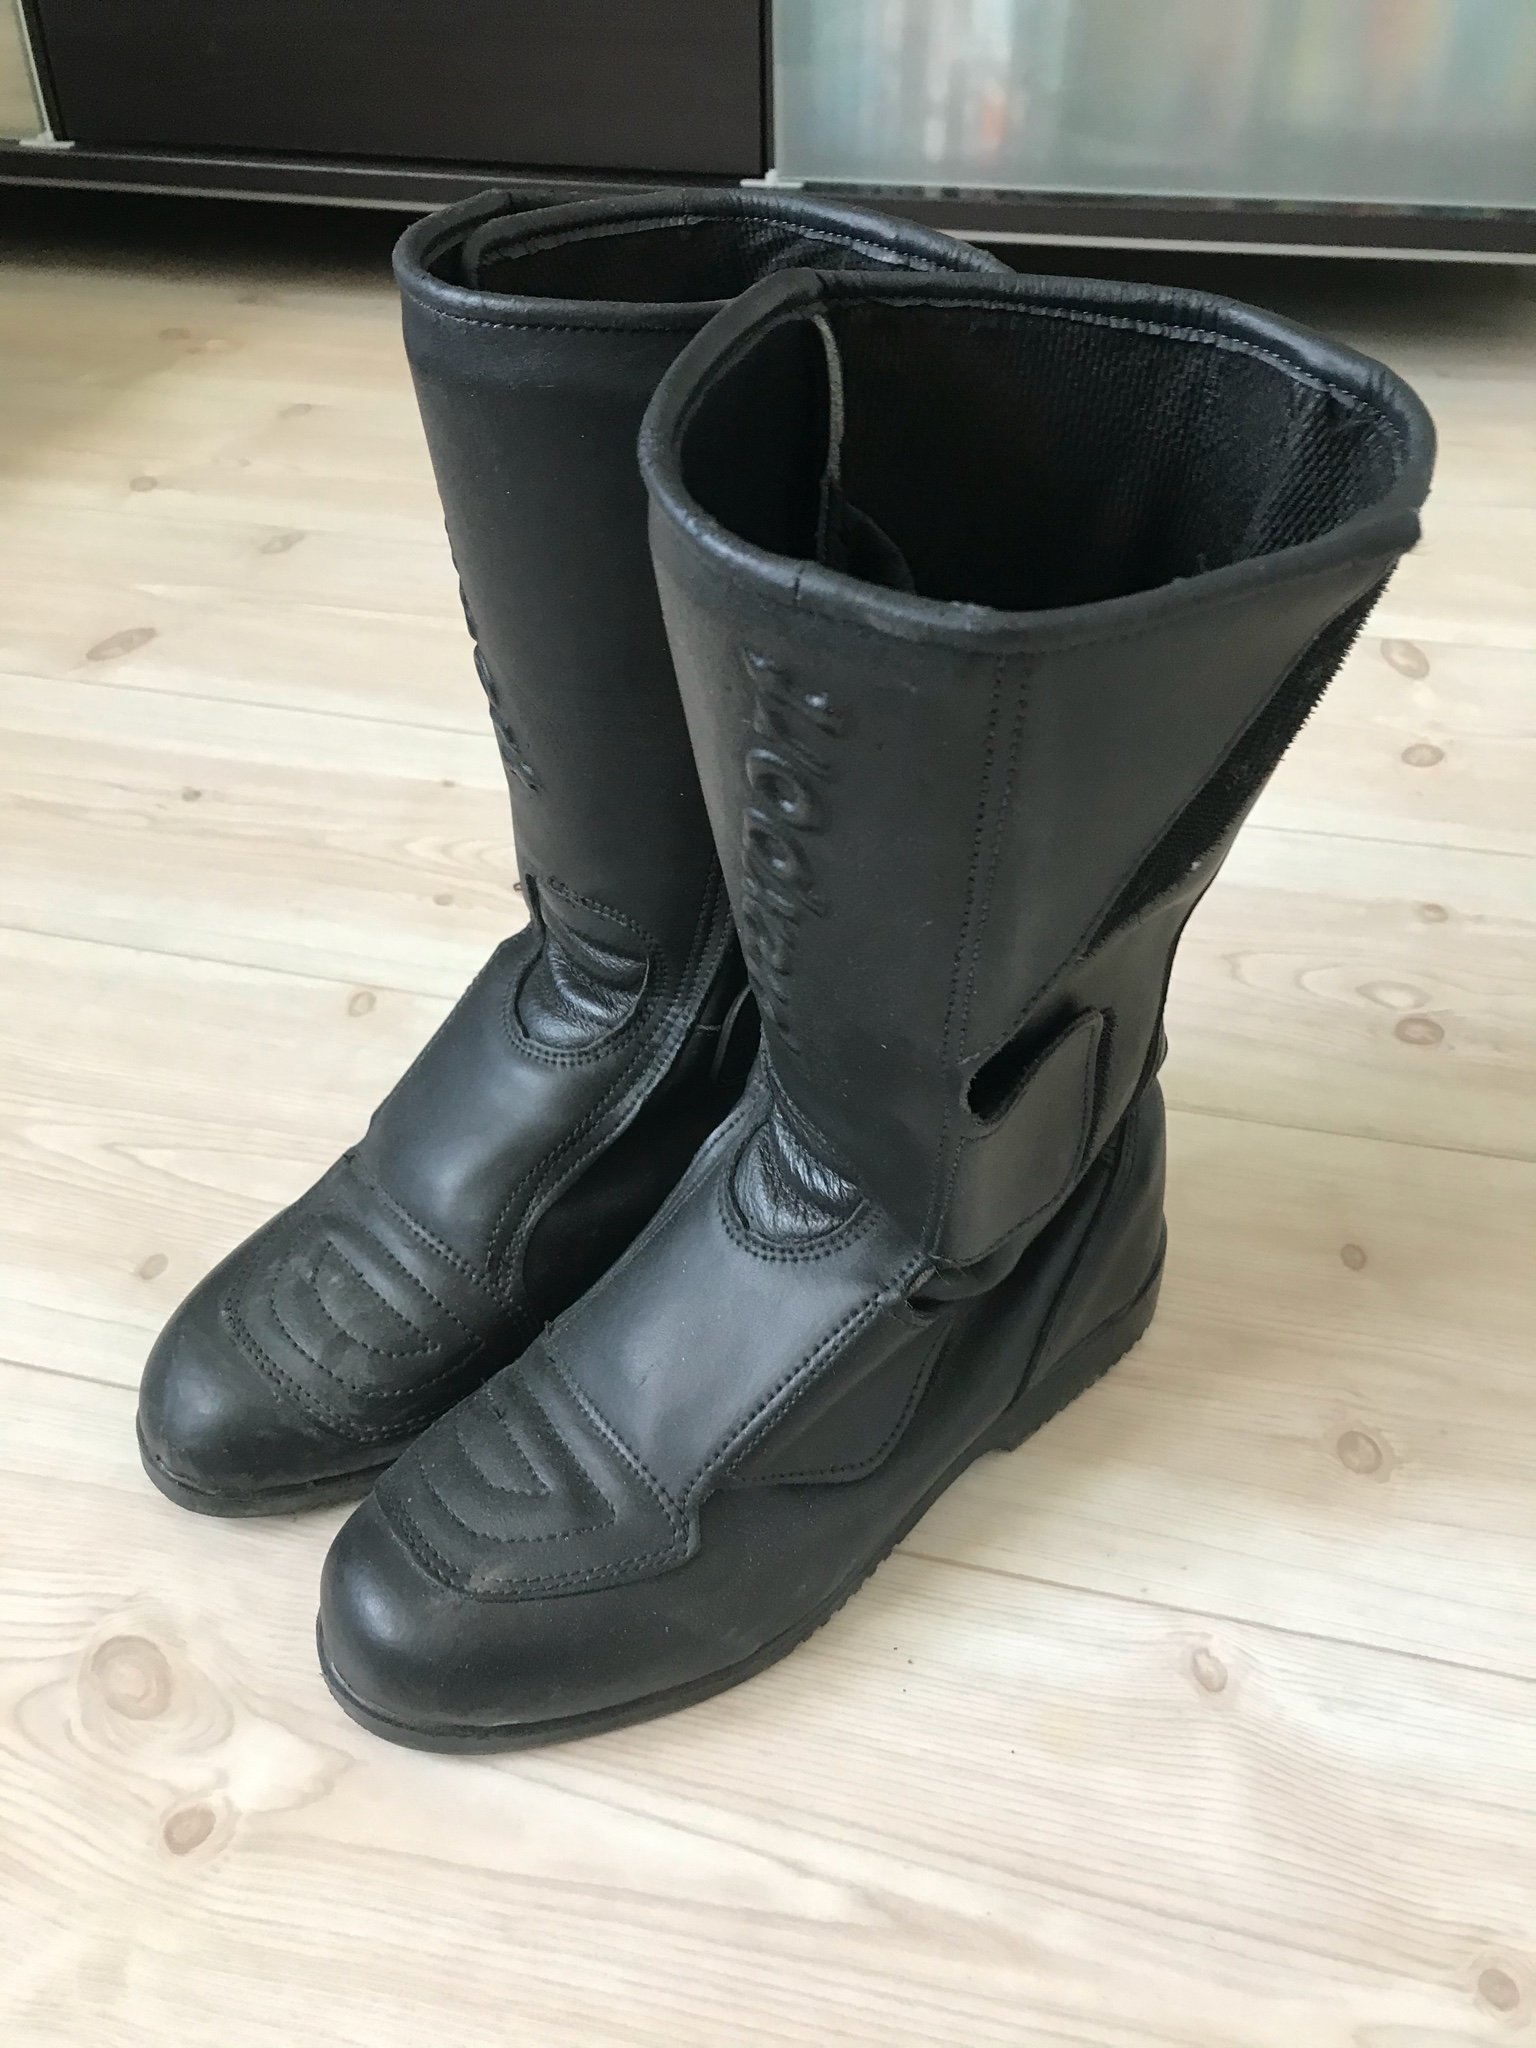 Mc stövlar, svart läder, Prexport